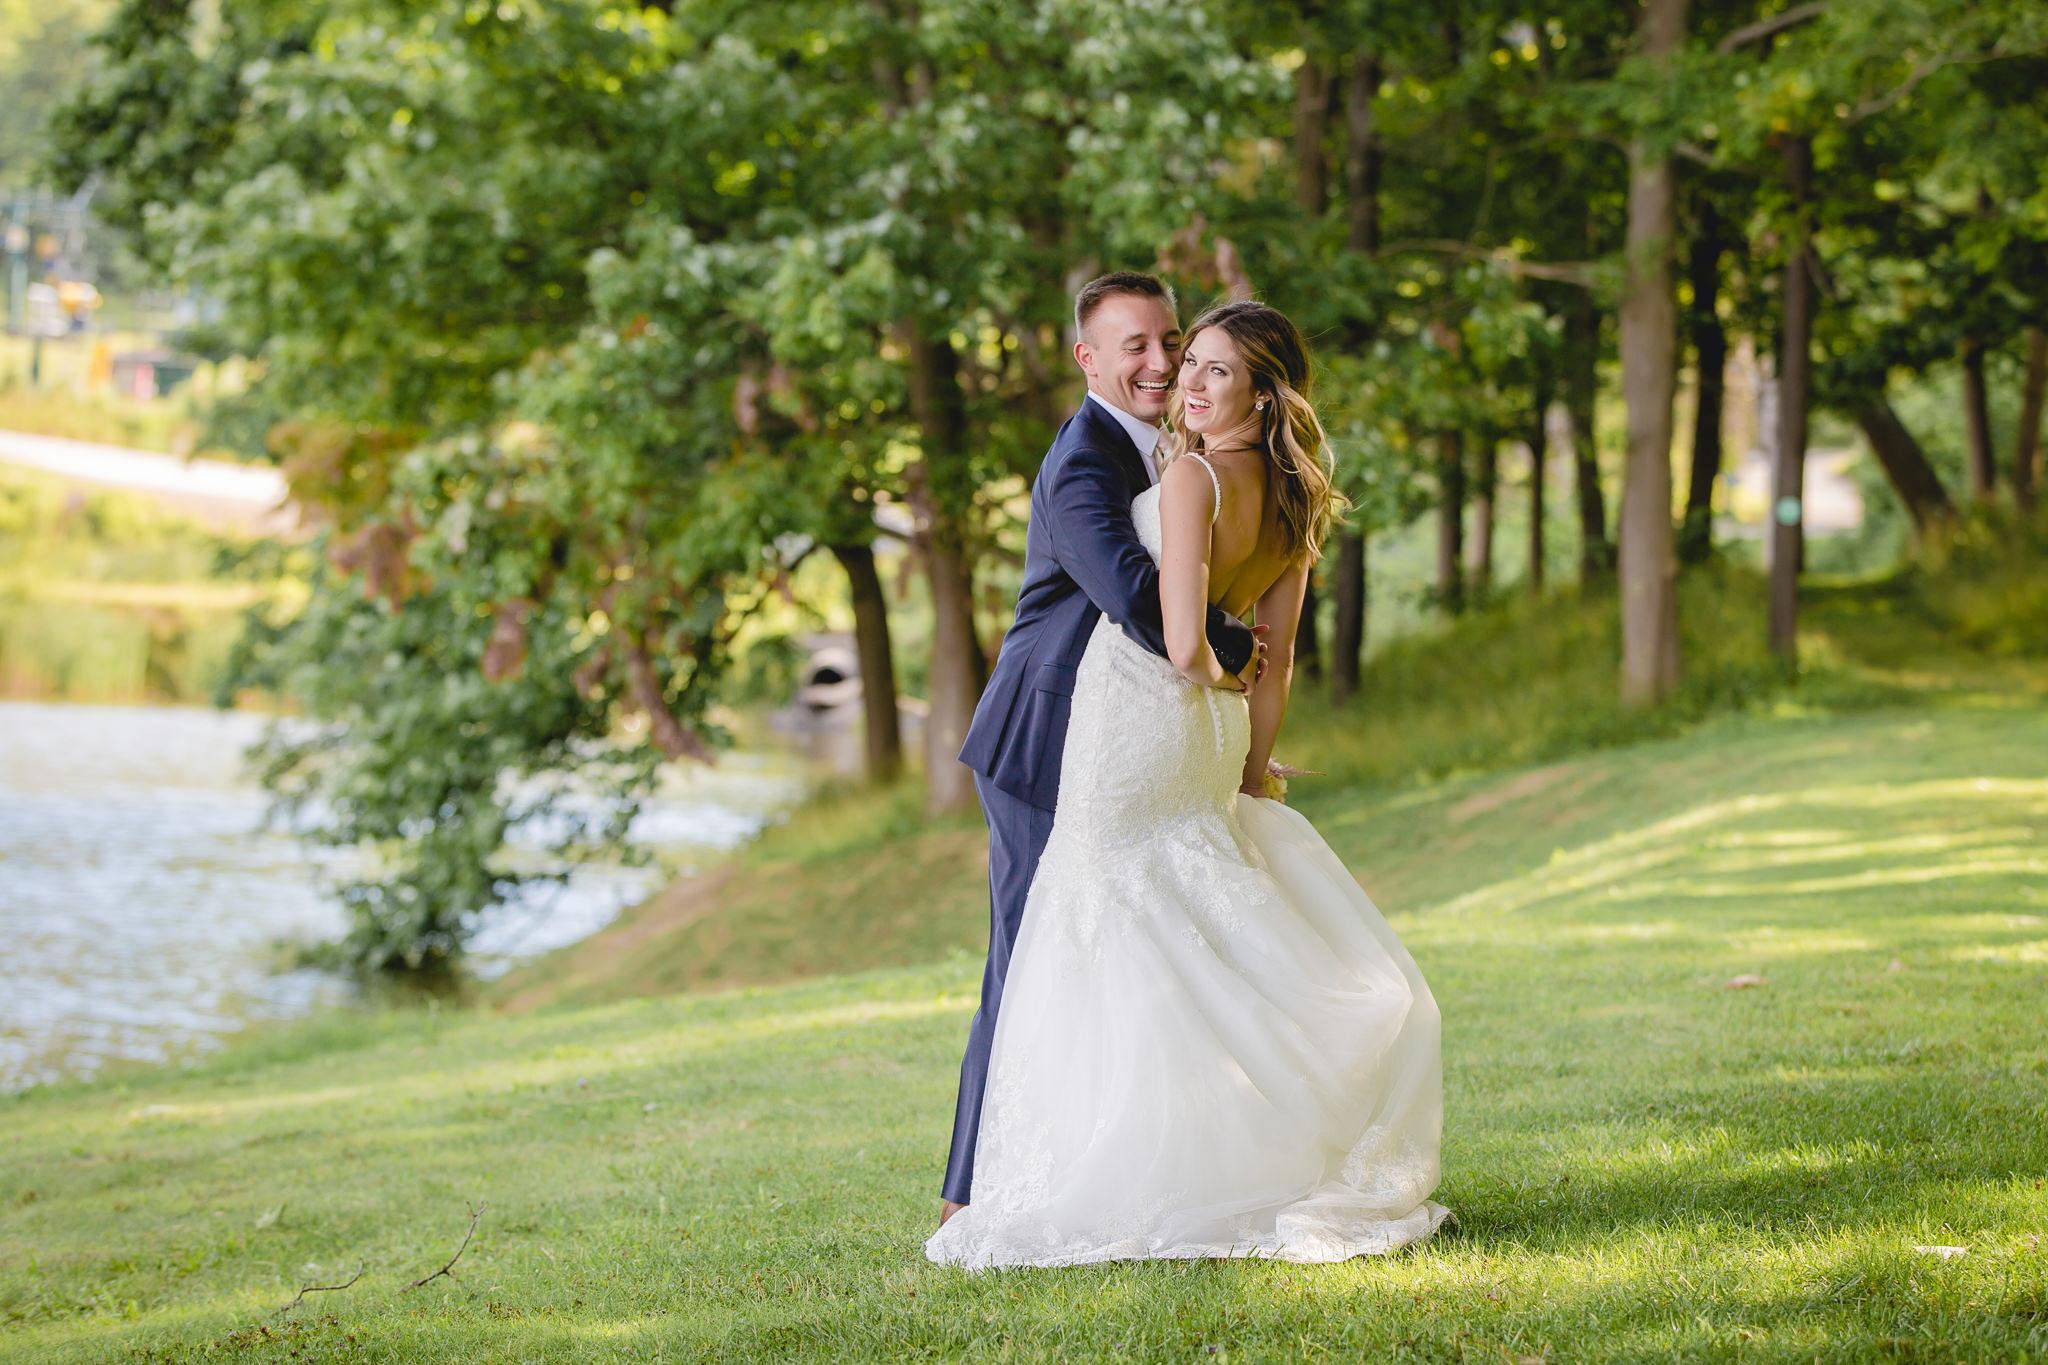 Bride and groom flirt during portraits at Hidden Valley Resort